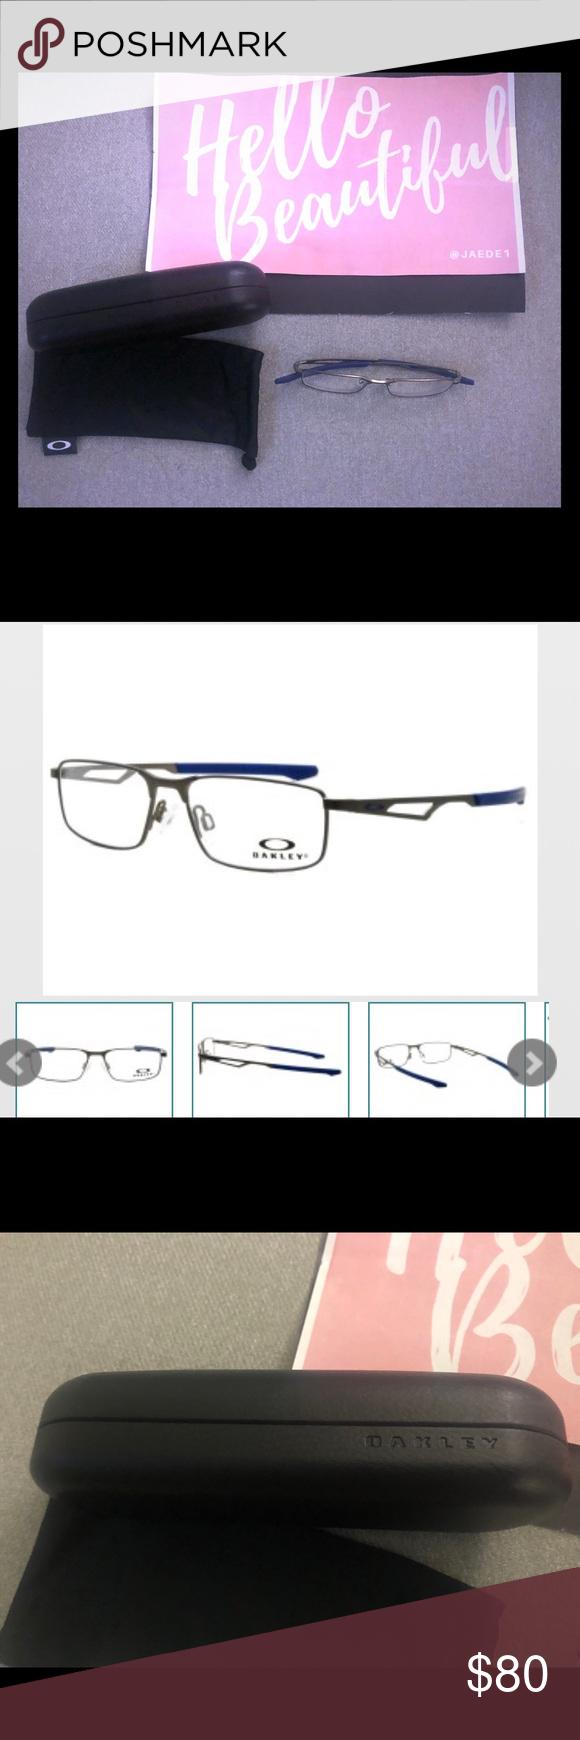 e22c7eacd7 Oakley Barspin XS OY3001-0347 KIDS Eyeglasses 👓 Oakley Barspin XS OY3001-0347  Matte